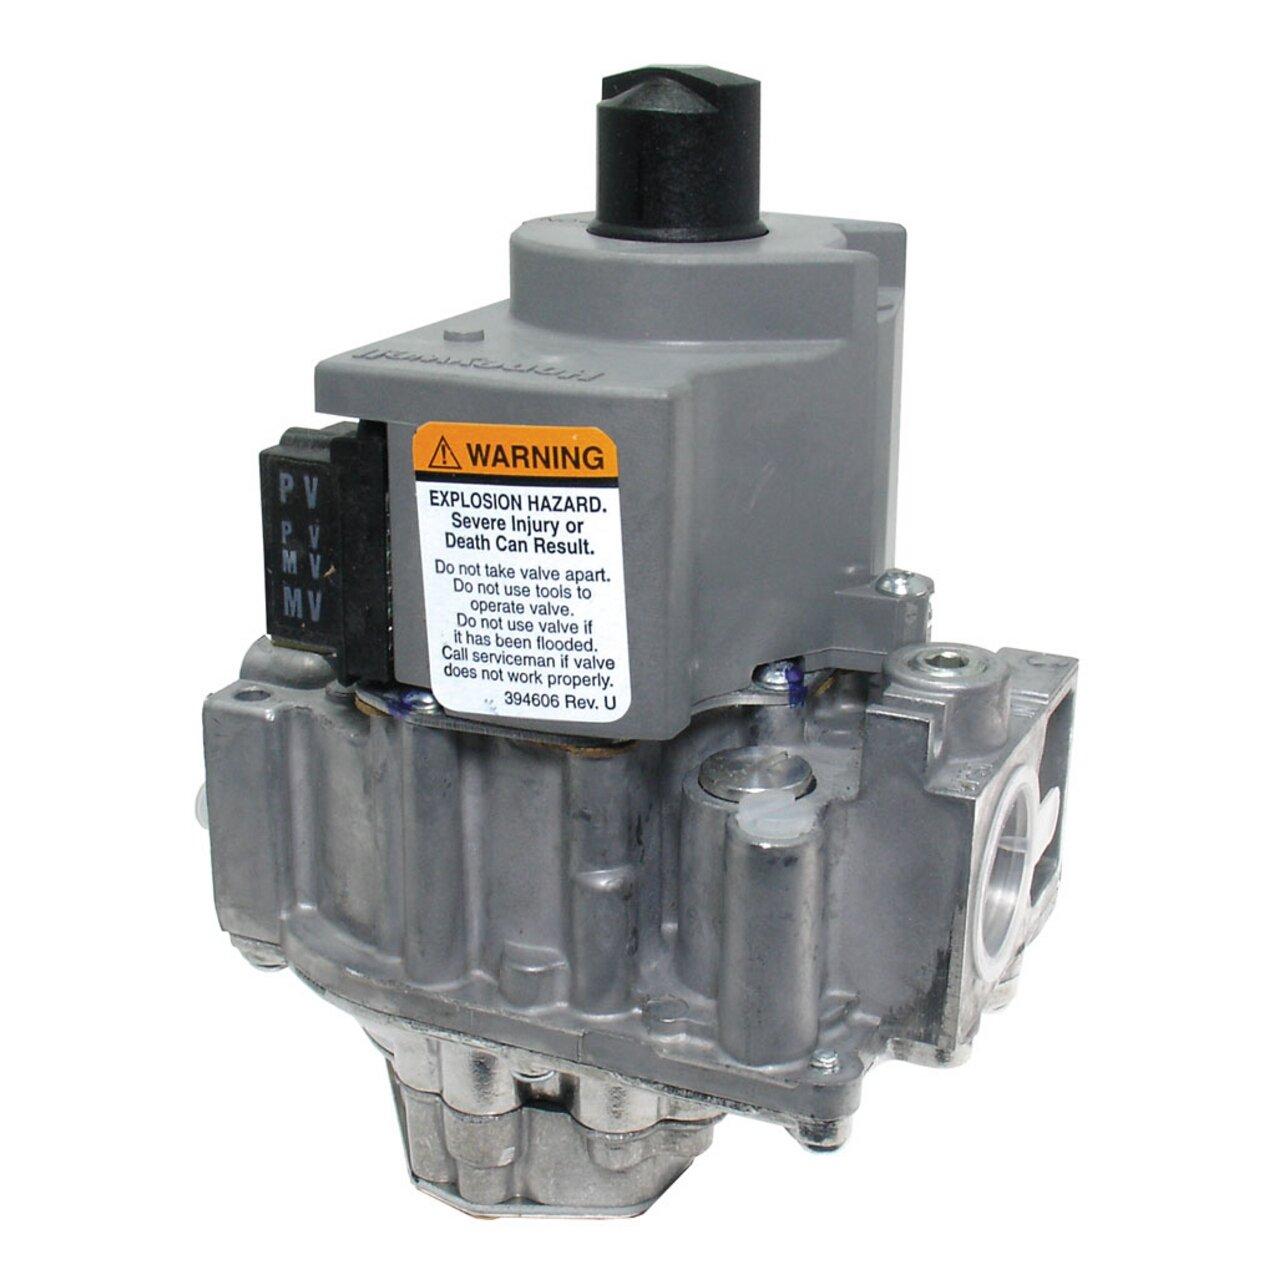 rheem gas valve. rheem sp10963d gas valve, natural - water heater replacement parts amazon.com valve